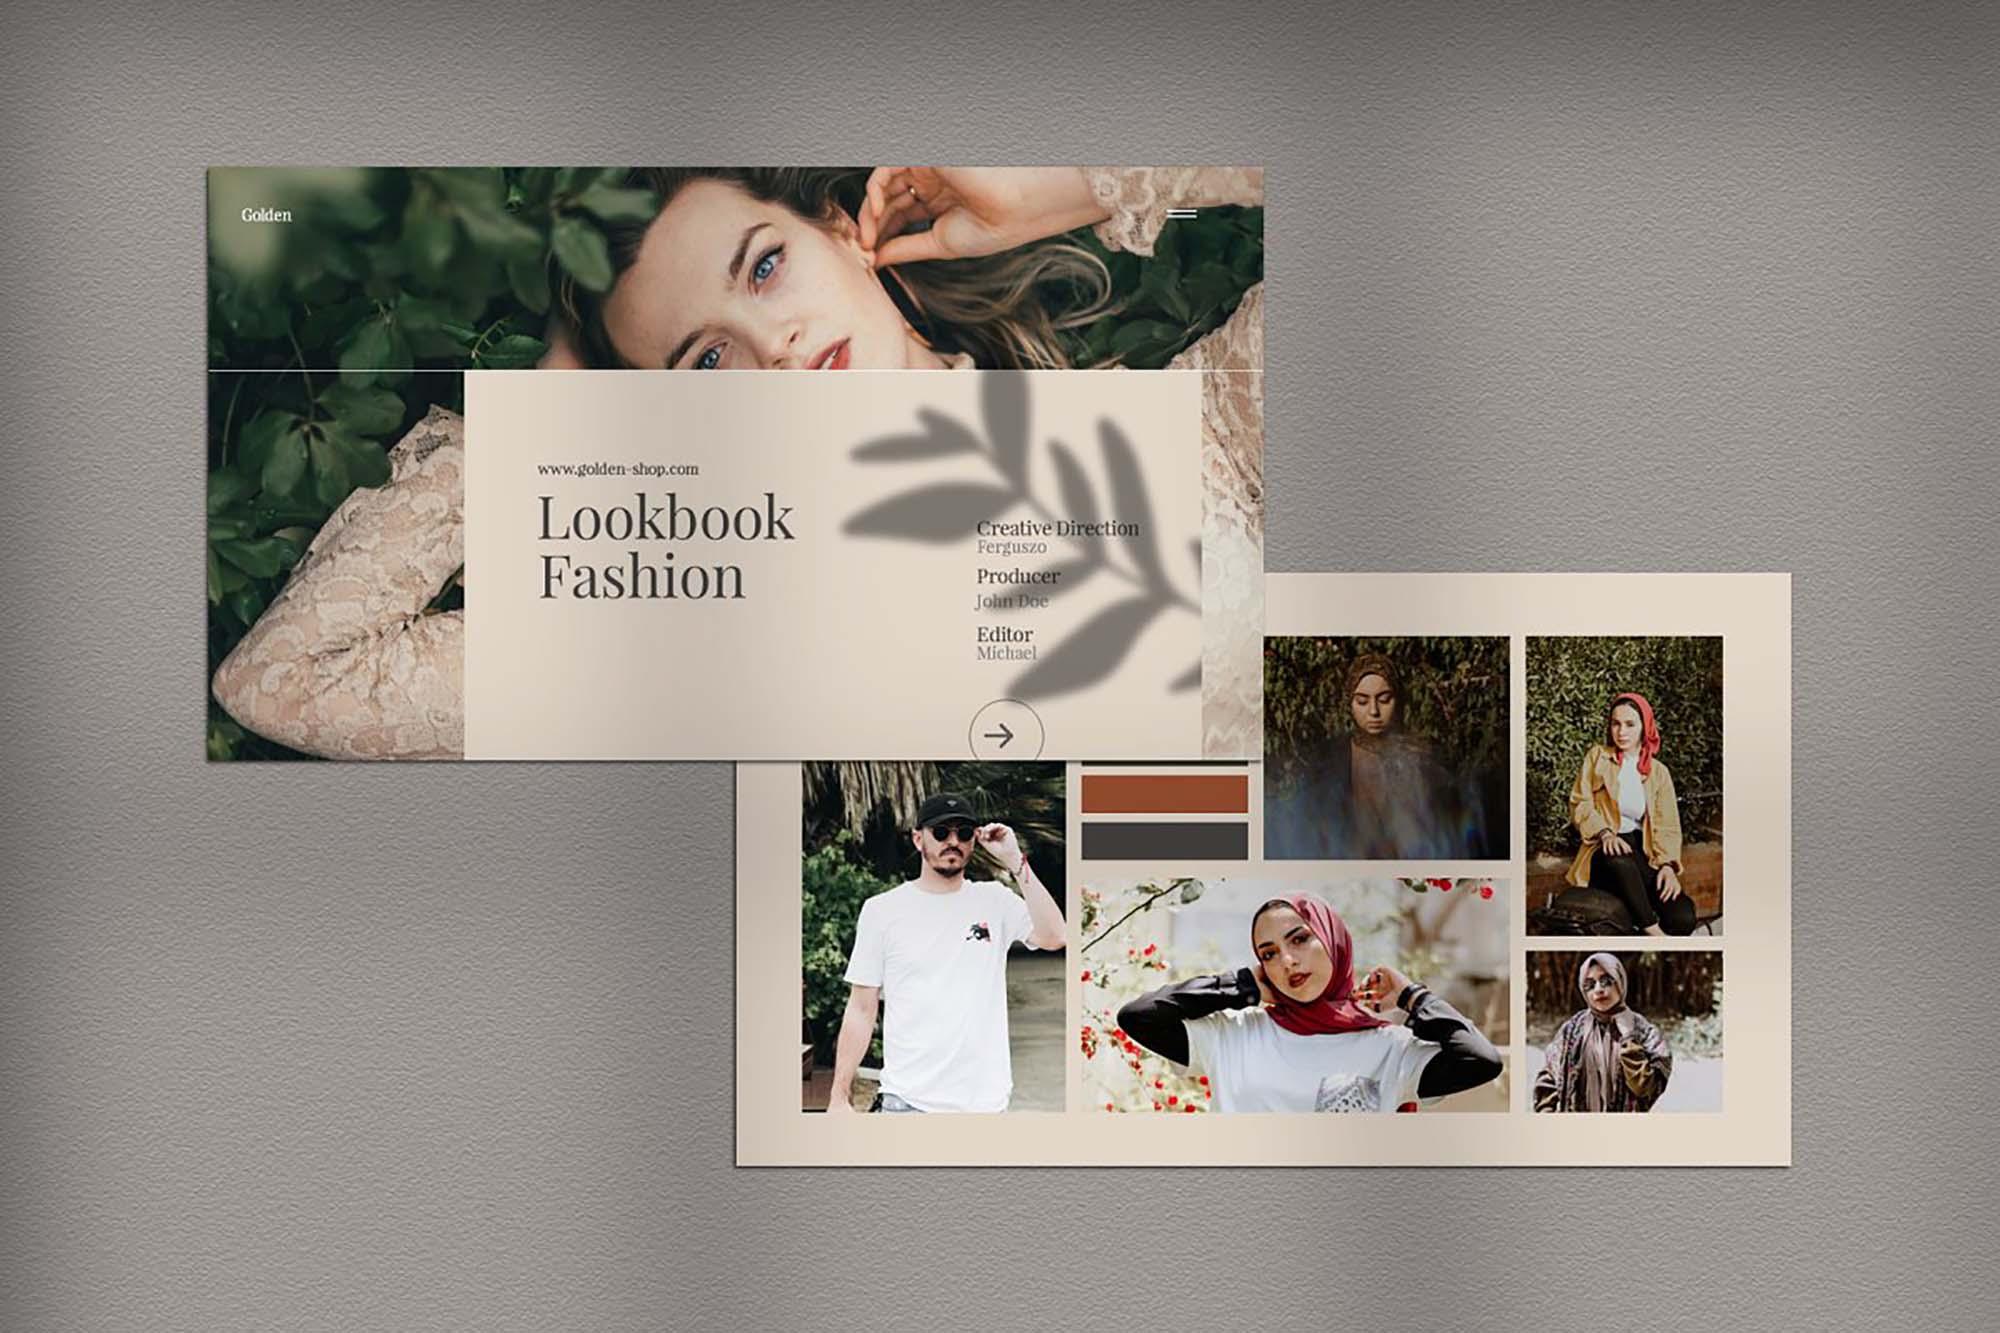 Golden Lookbook Fashion Powerpoint 1